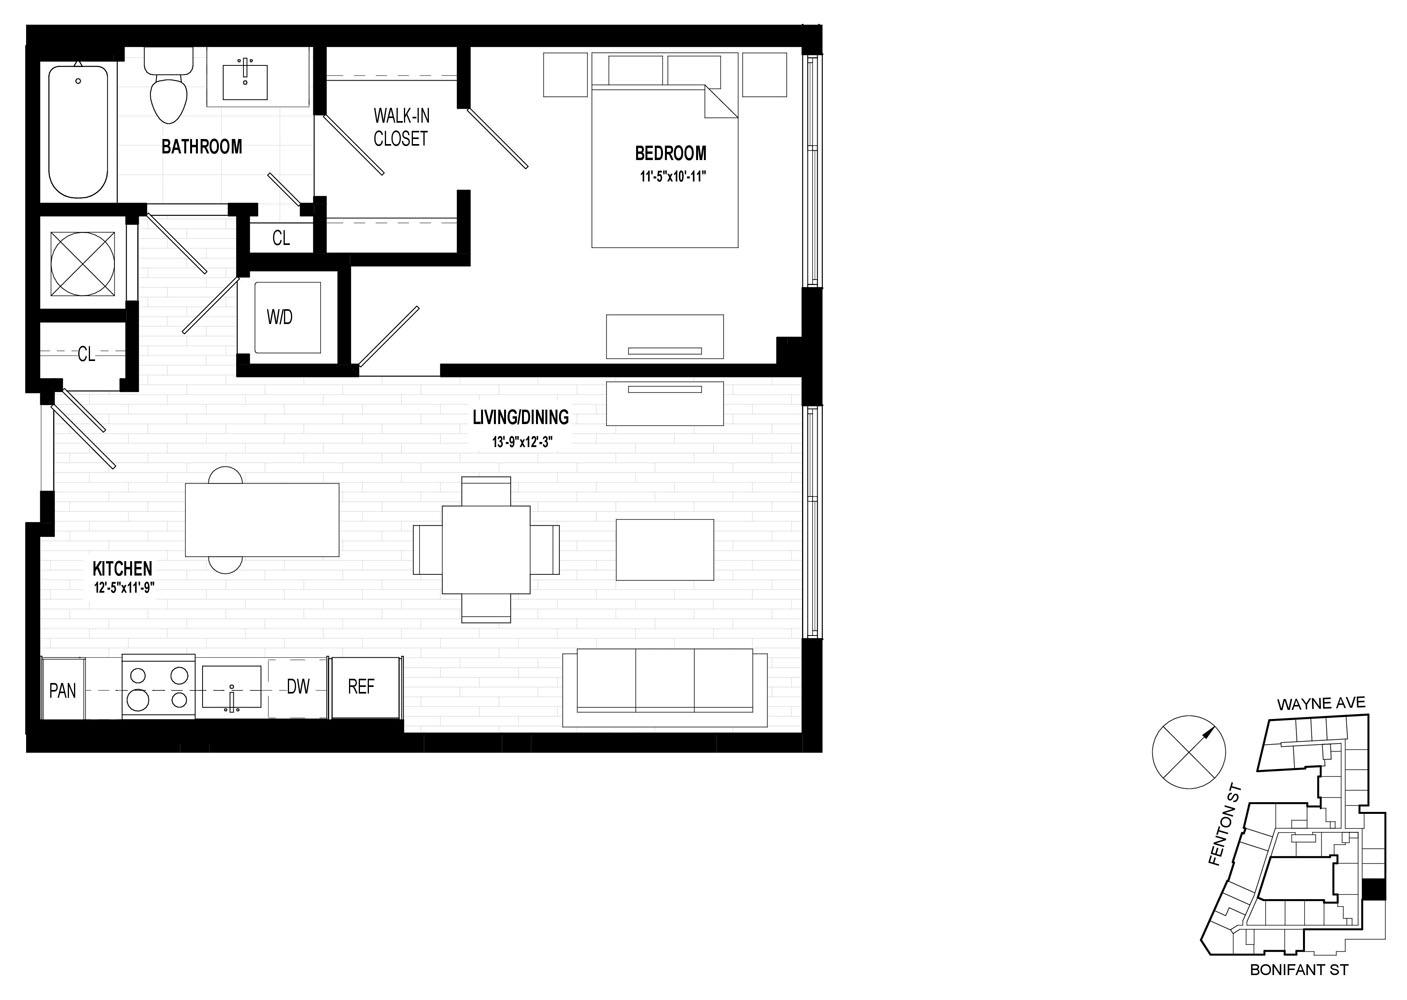 P0578887 761aa14 central a04b 657 2 floorplan